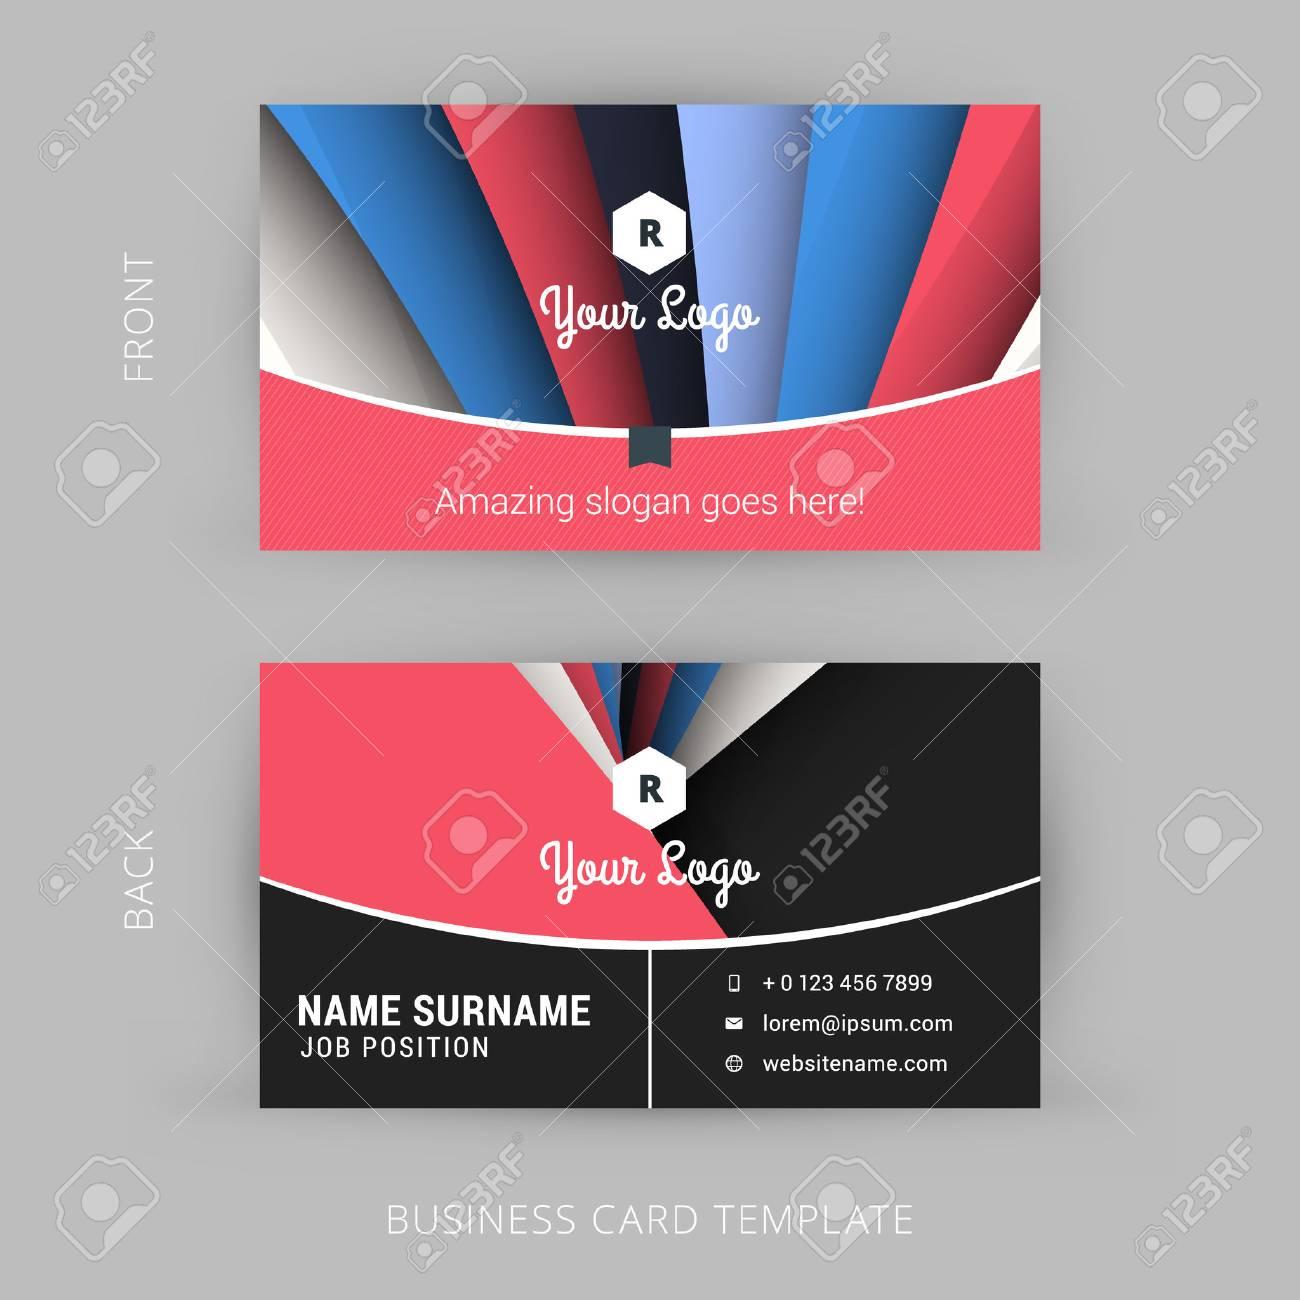 invitation cards for shop opening best of new office invitation card bid card template bid card template hatch urbanskript co azul elcuervoazul com